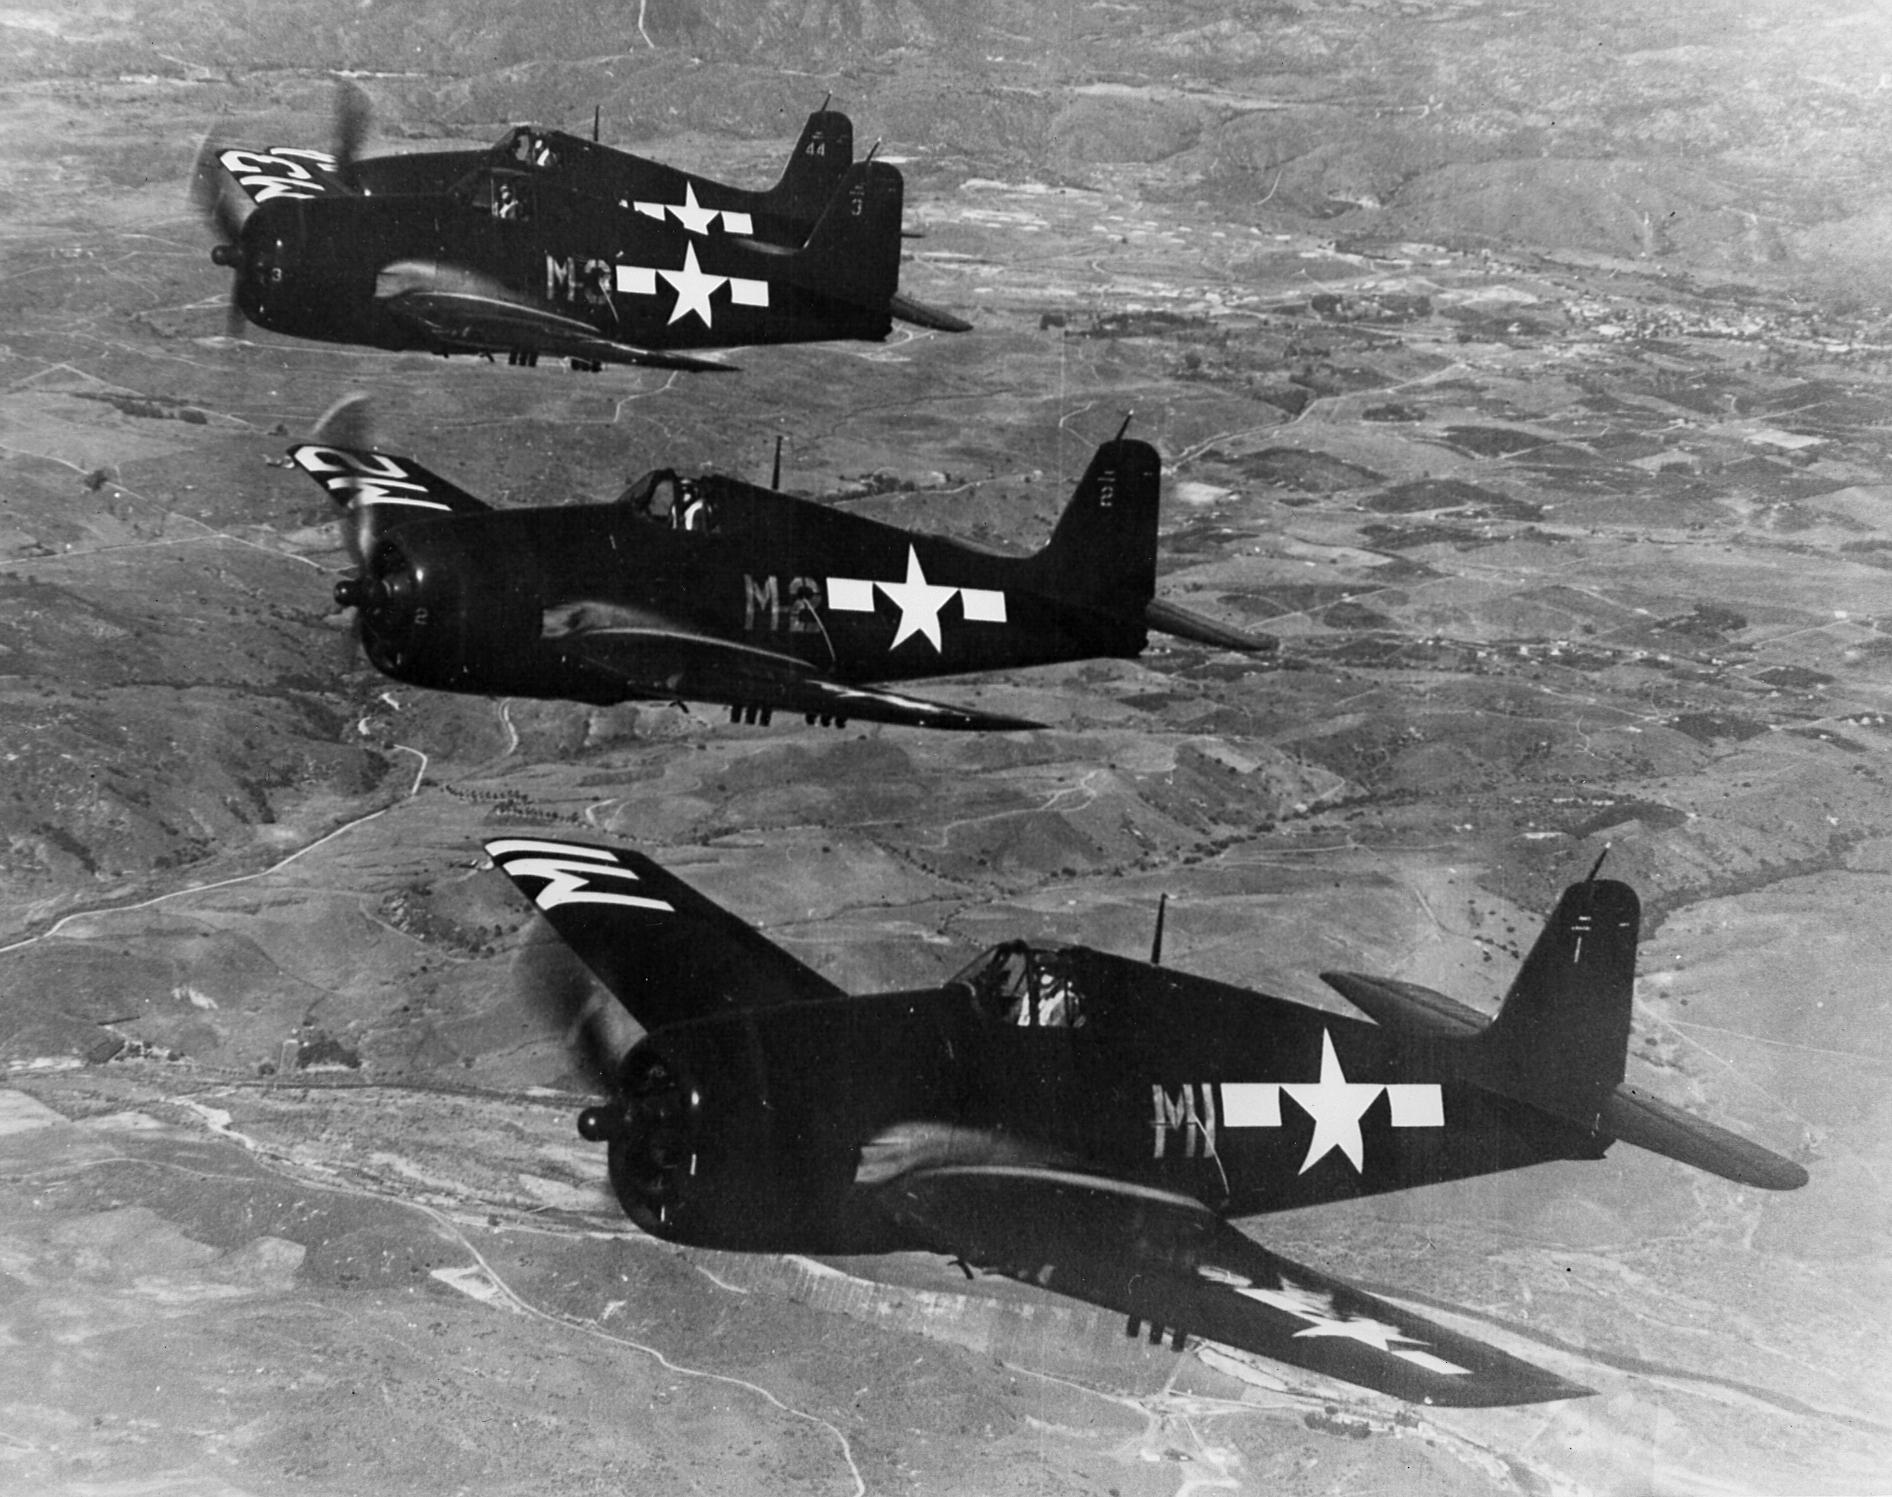 Grumman F6F 5 Hellcat VF 7 Yellow M1 M2 M3 and M44 from CV 6 USS Enterprise 01